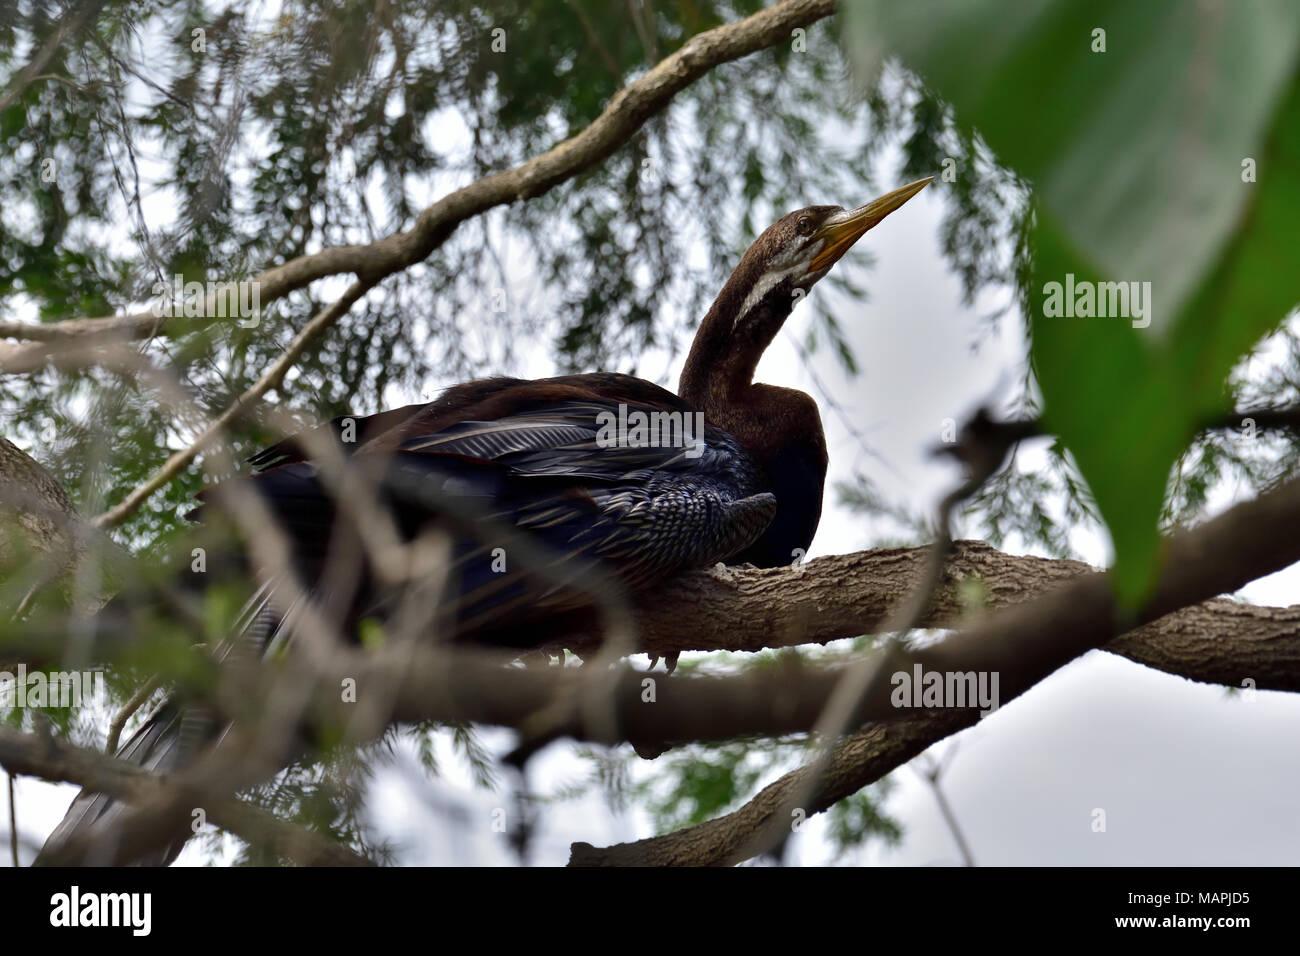 An Australian, Queensland Male Darter, Anhinga melanogaster resting on a Tree branch - Stock Image